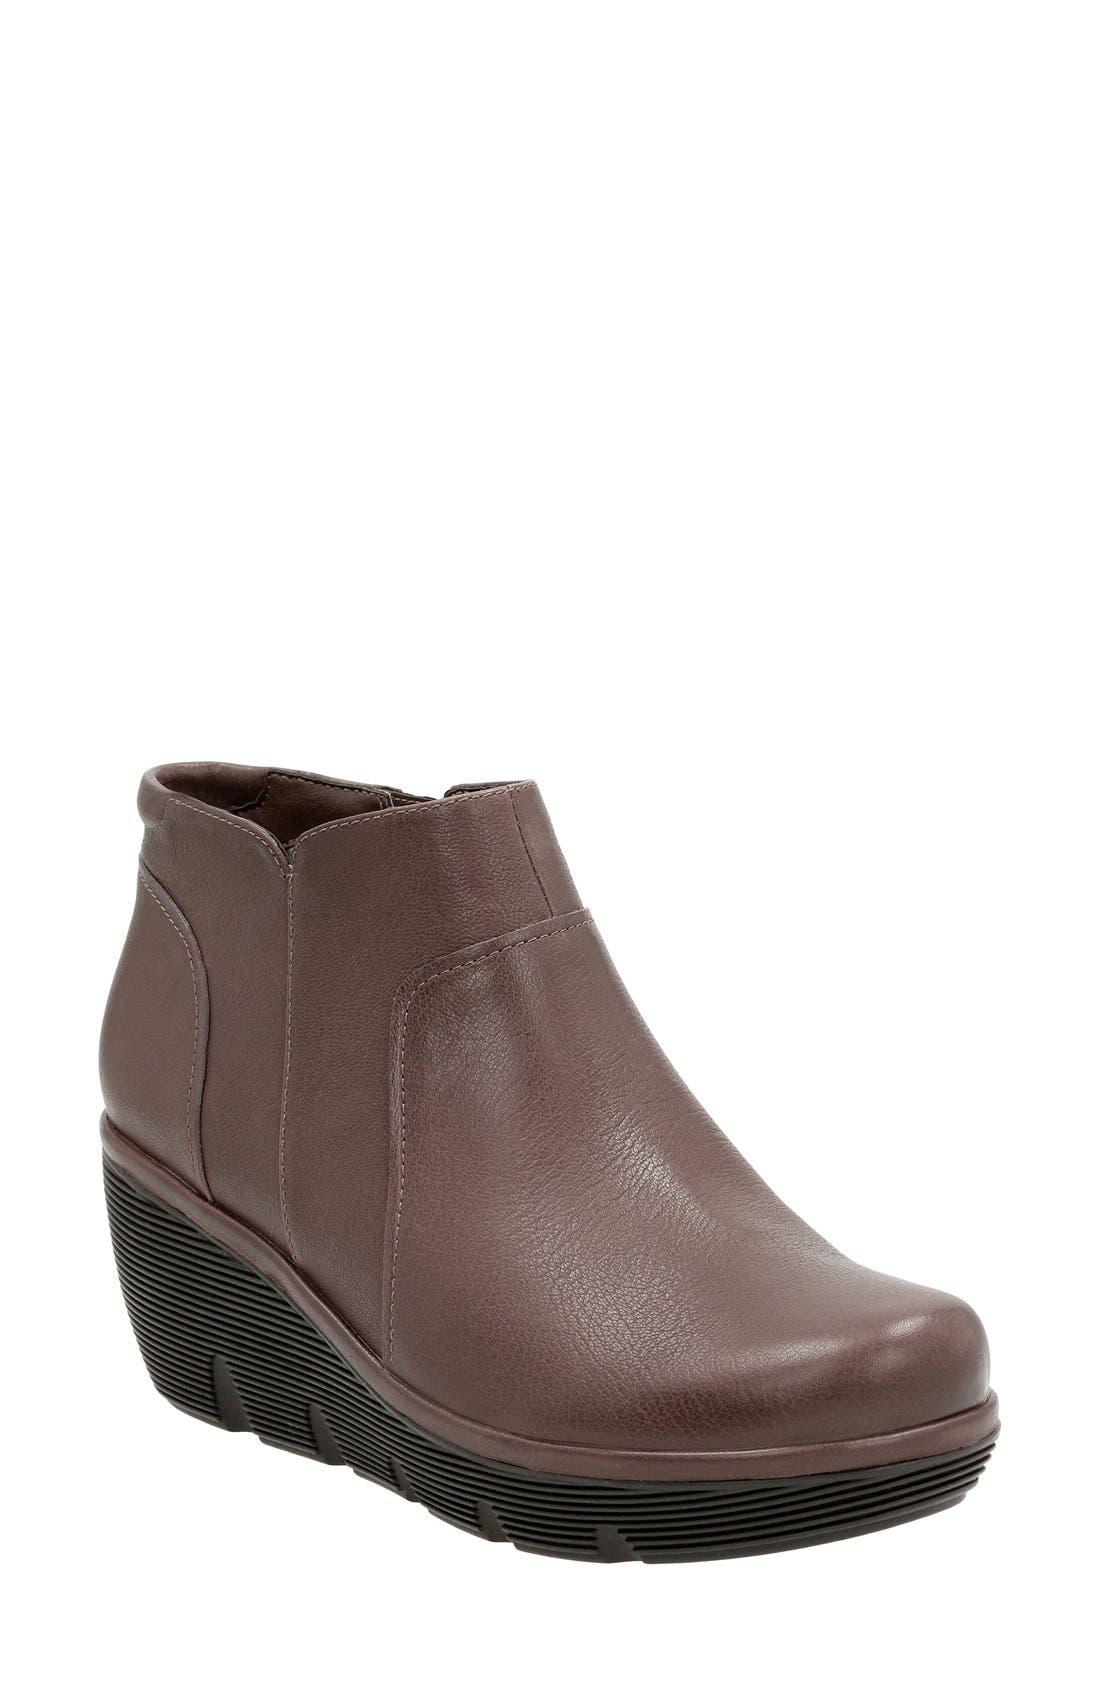 Alternate Image 1 Selected - Clarks® 'Clarene Sun' Wedge Boot (Women)